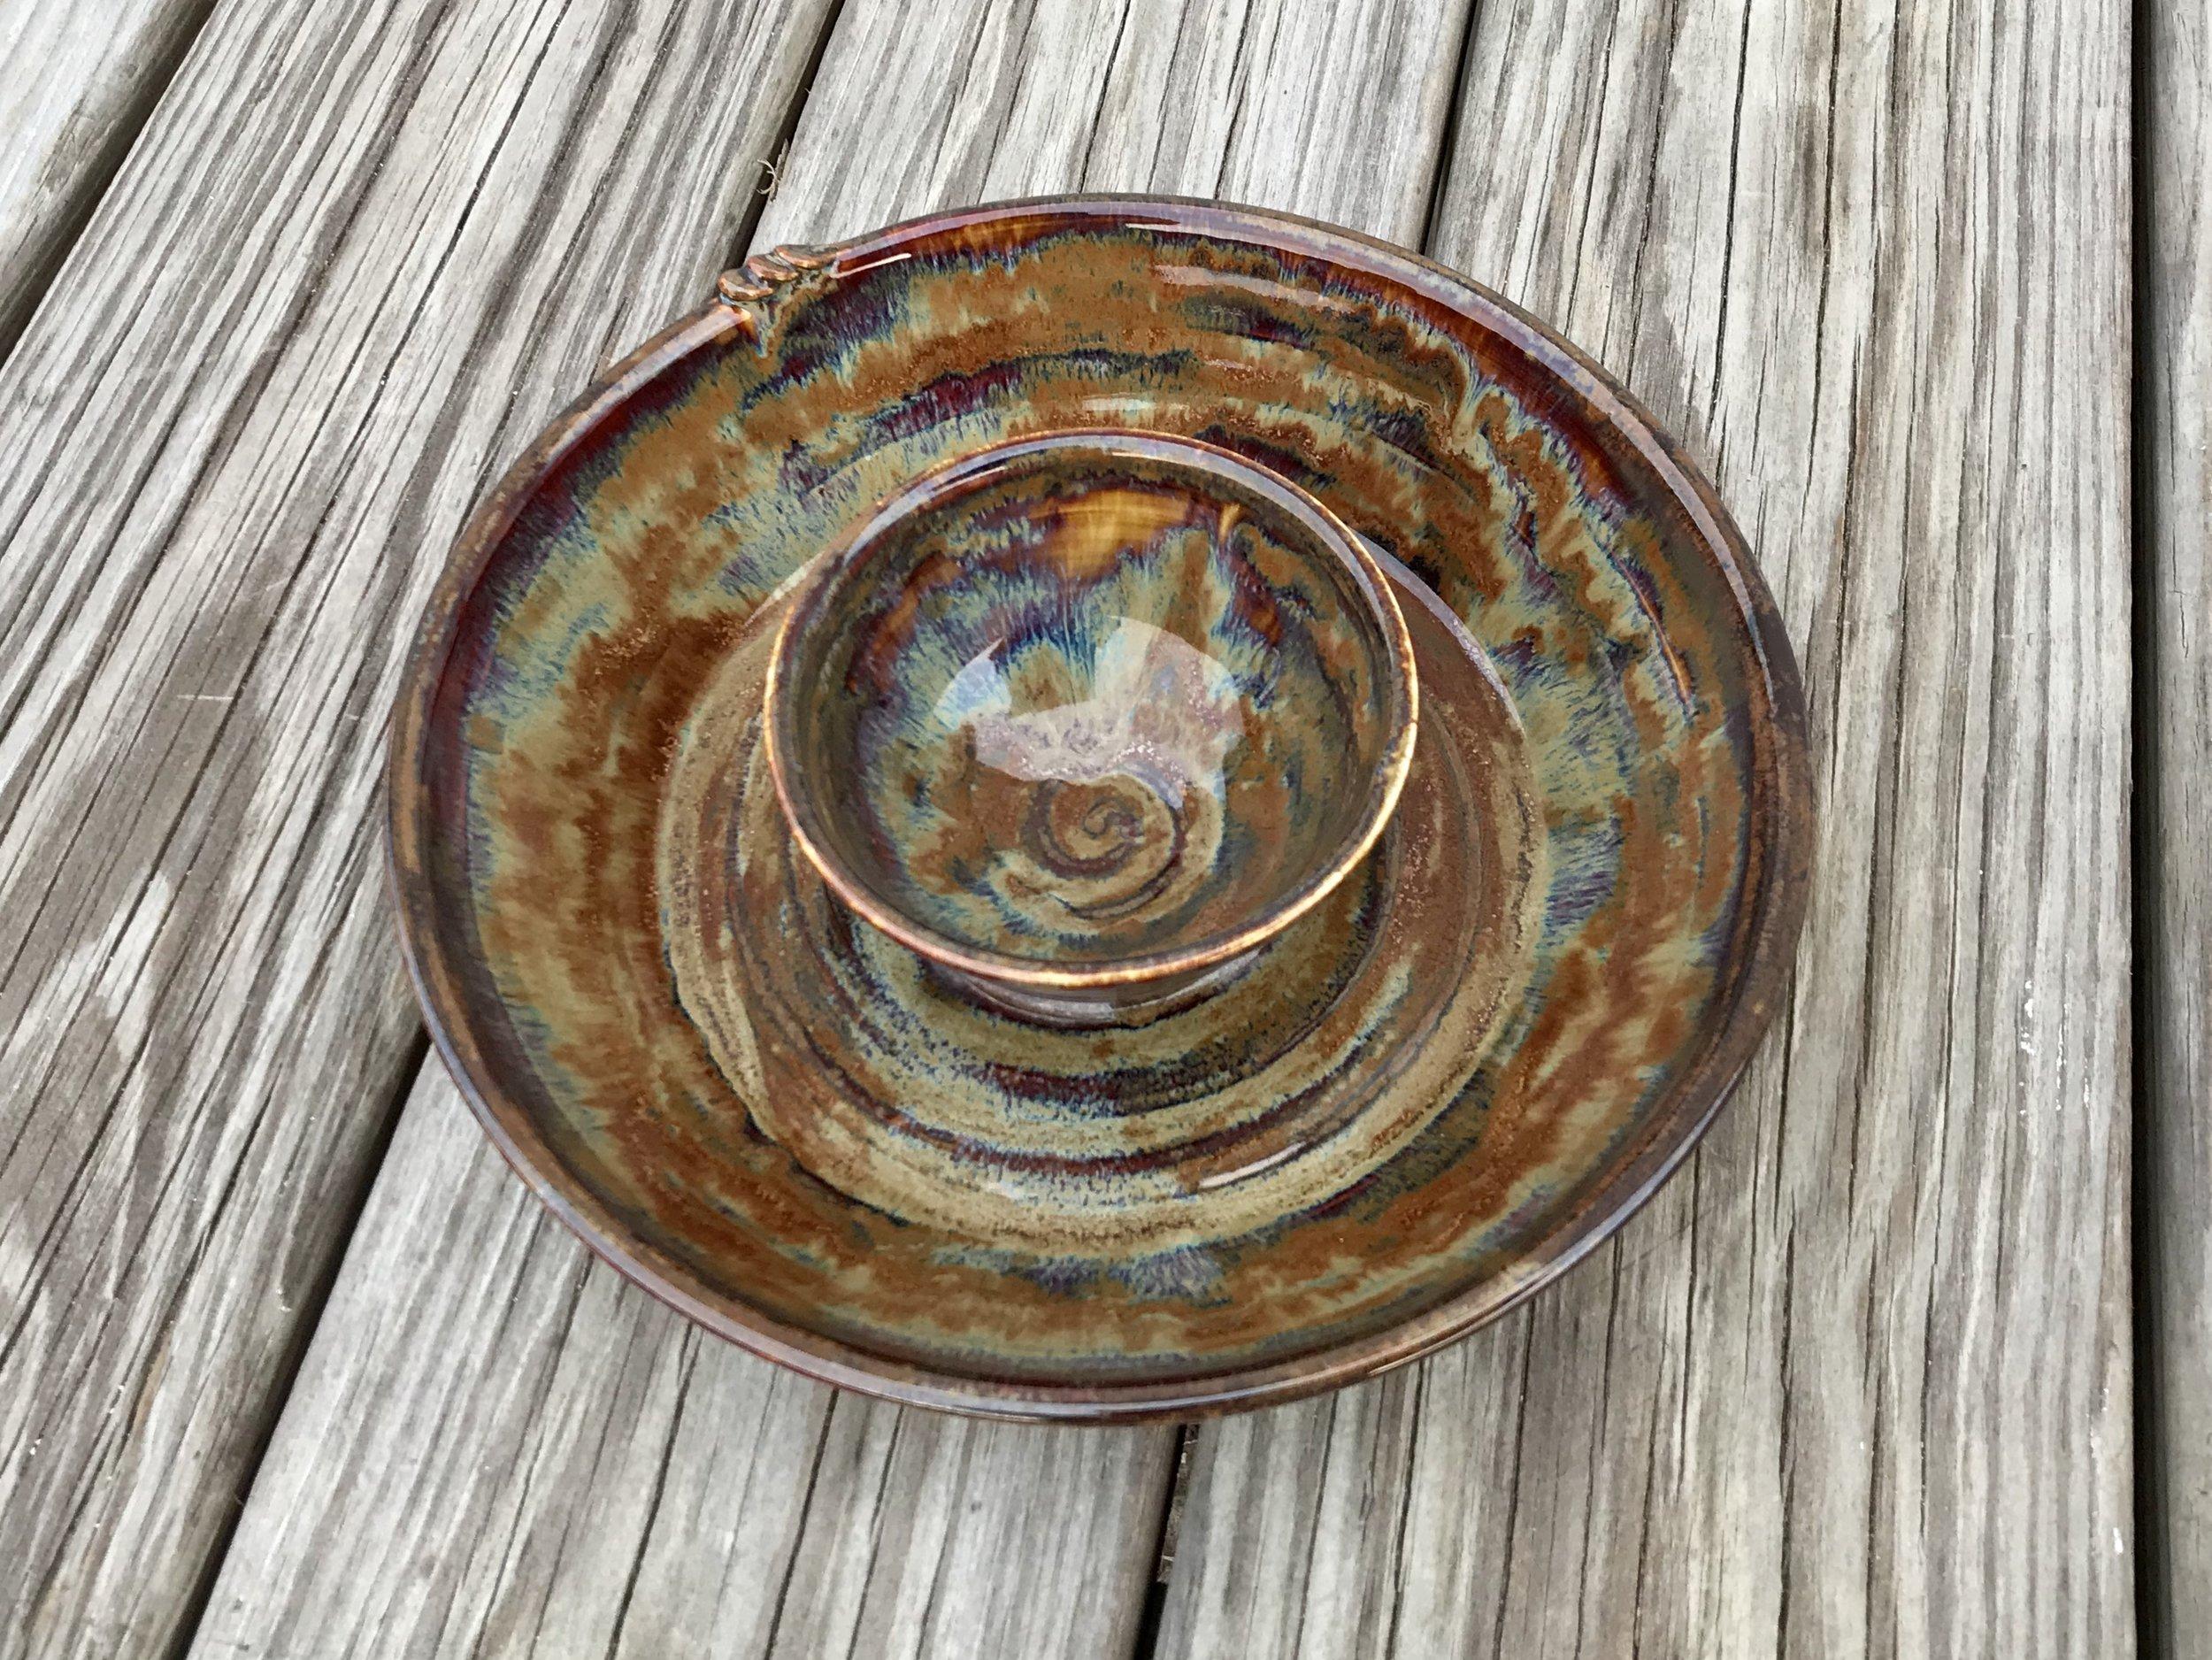 Earthtone Chip and Dip